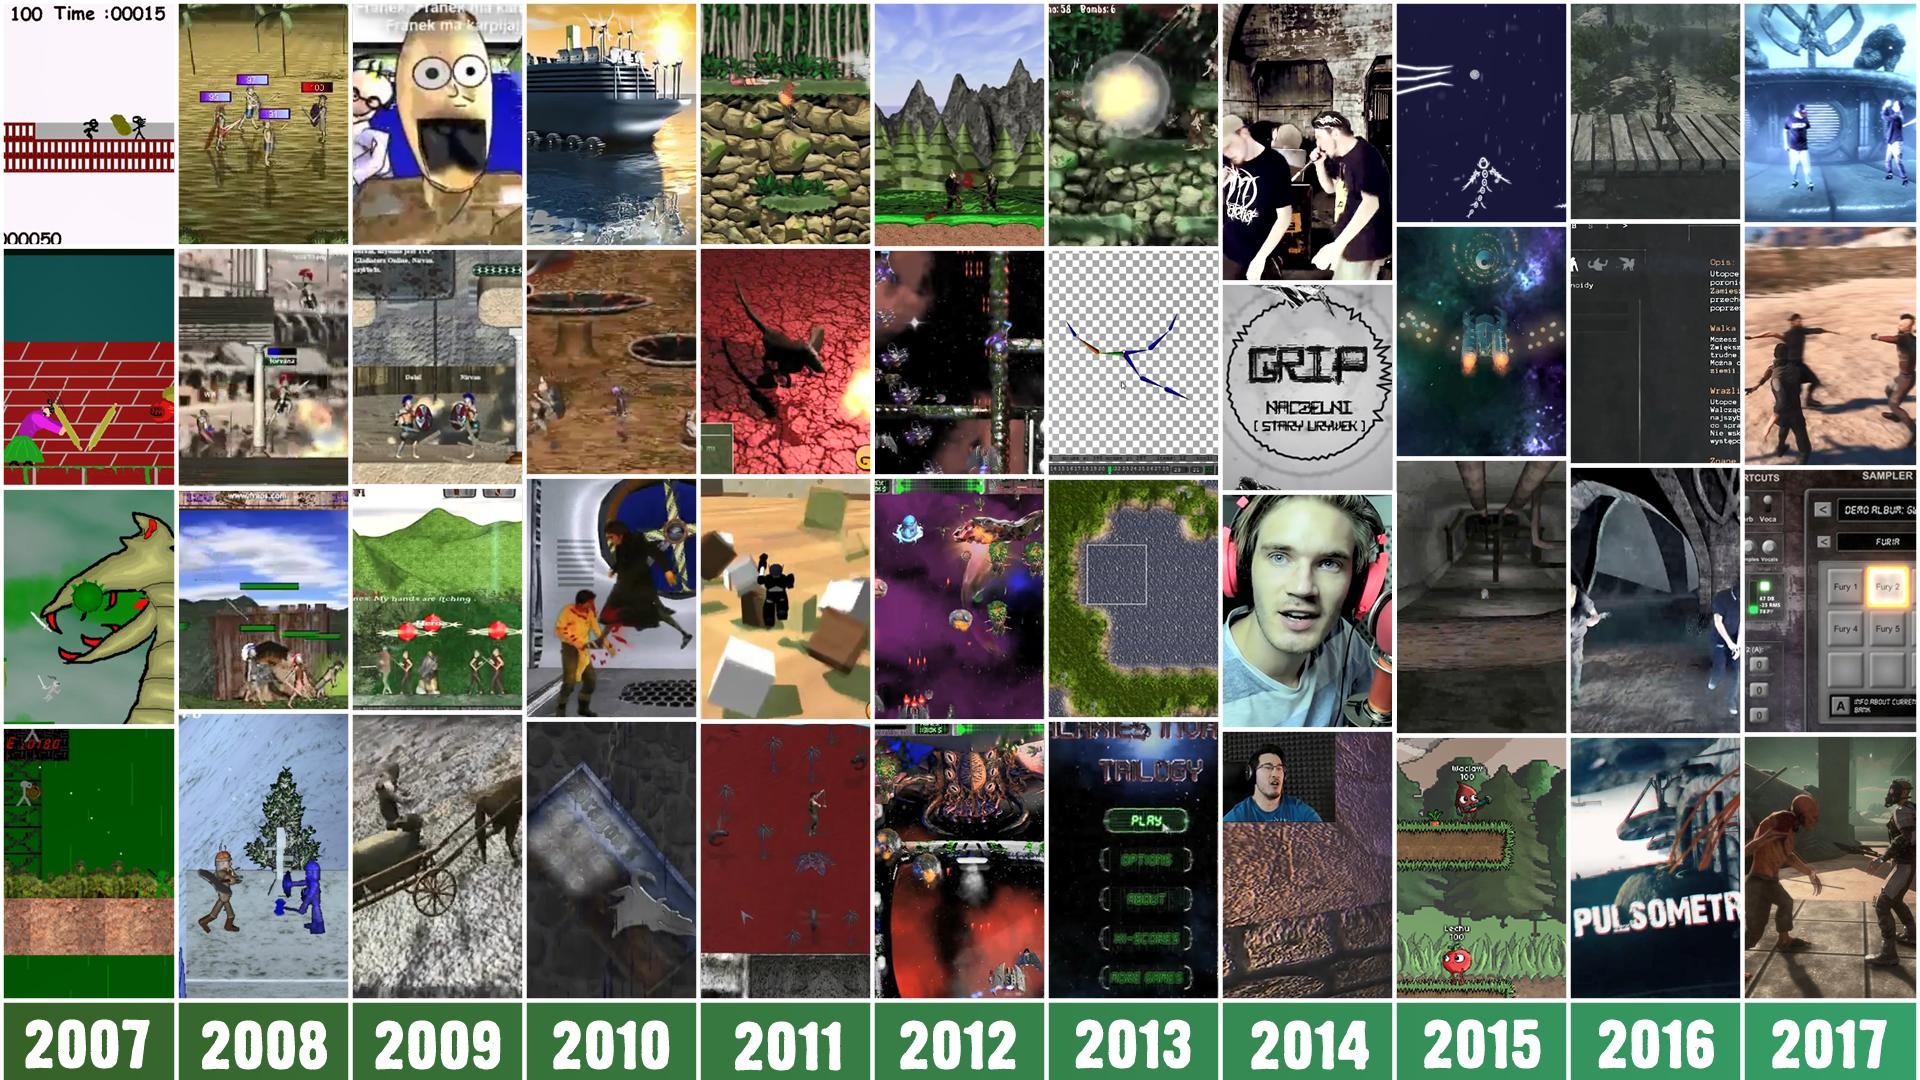 Gamedev journey since 2007